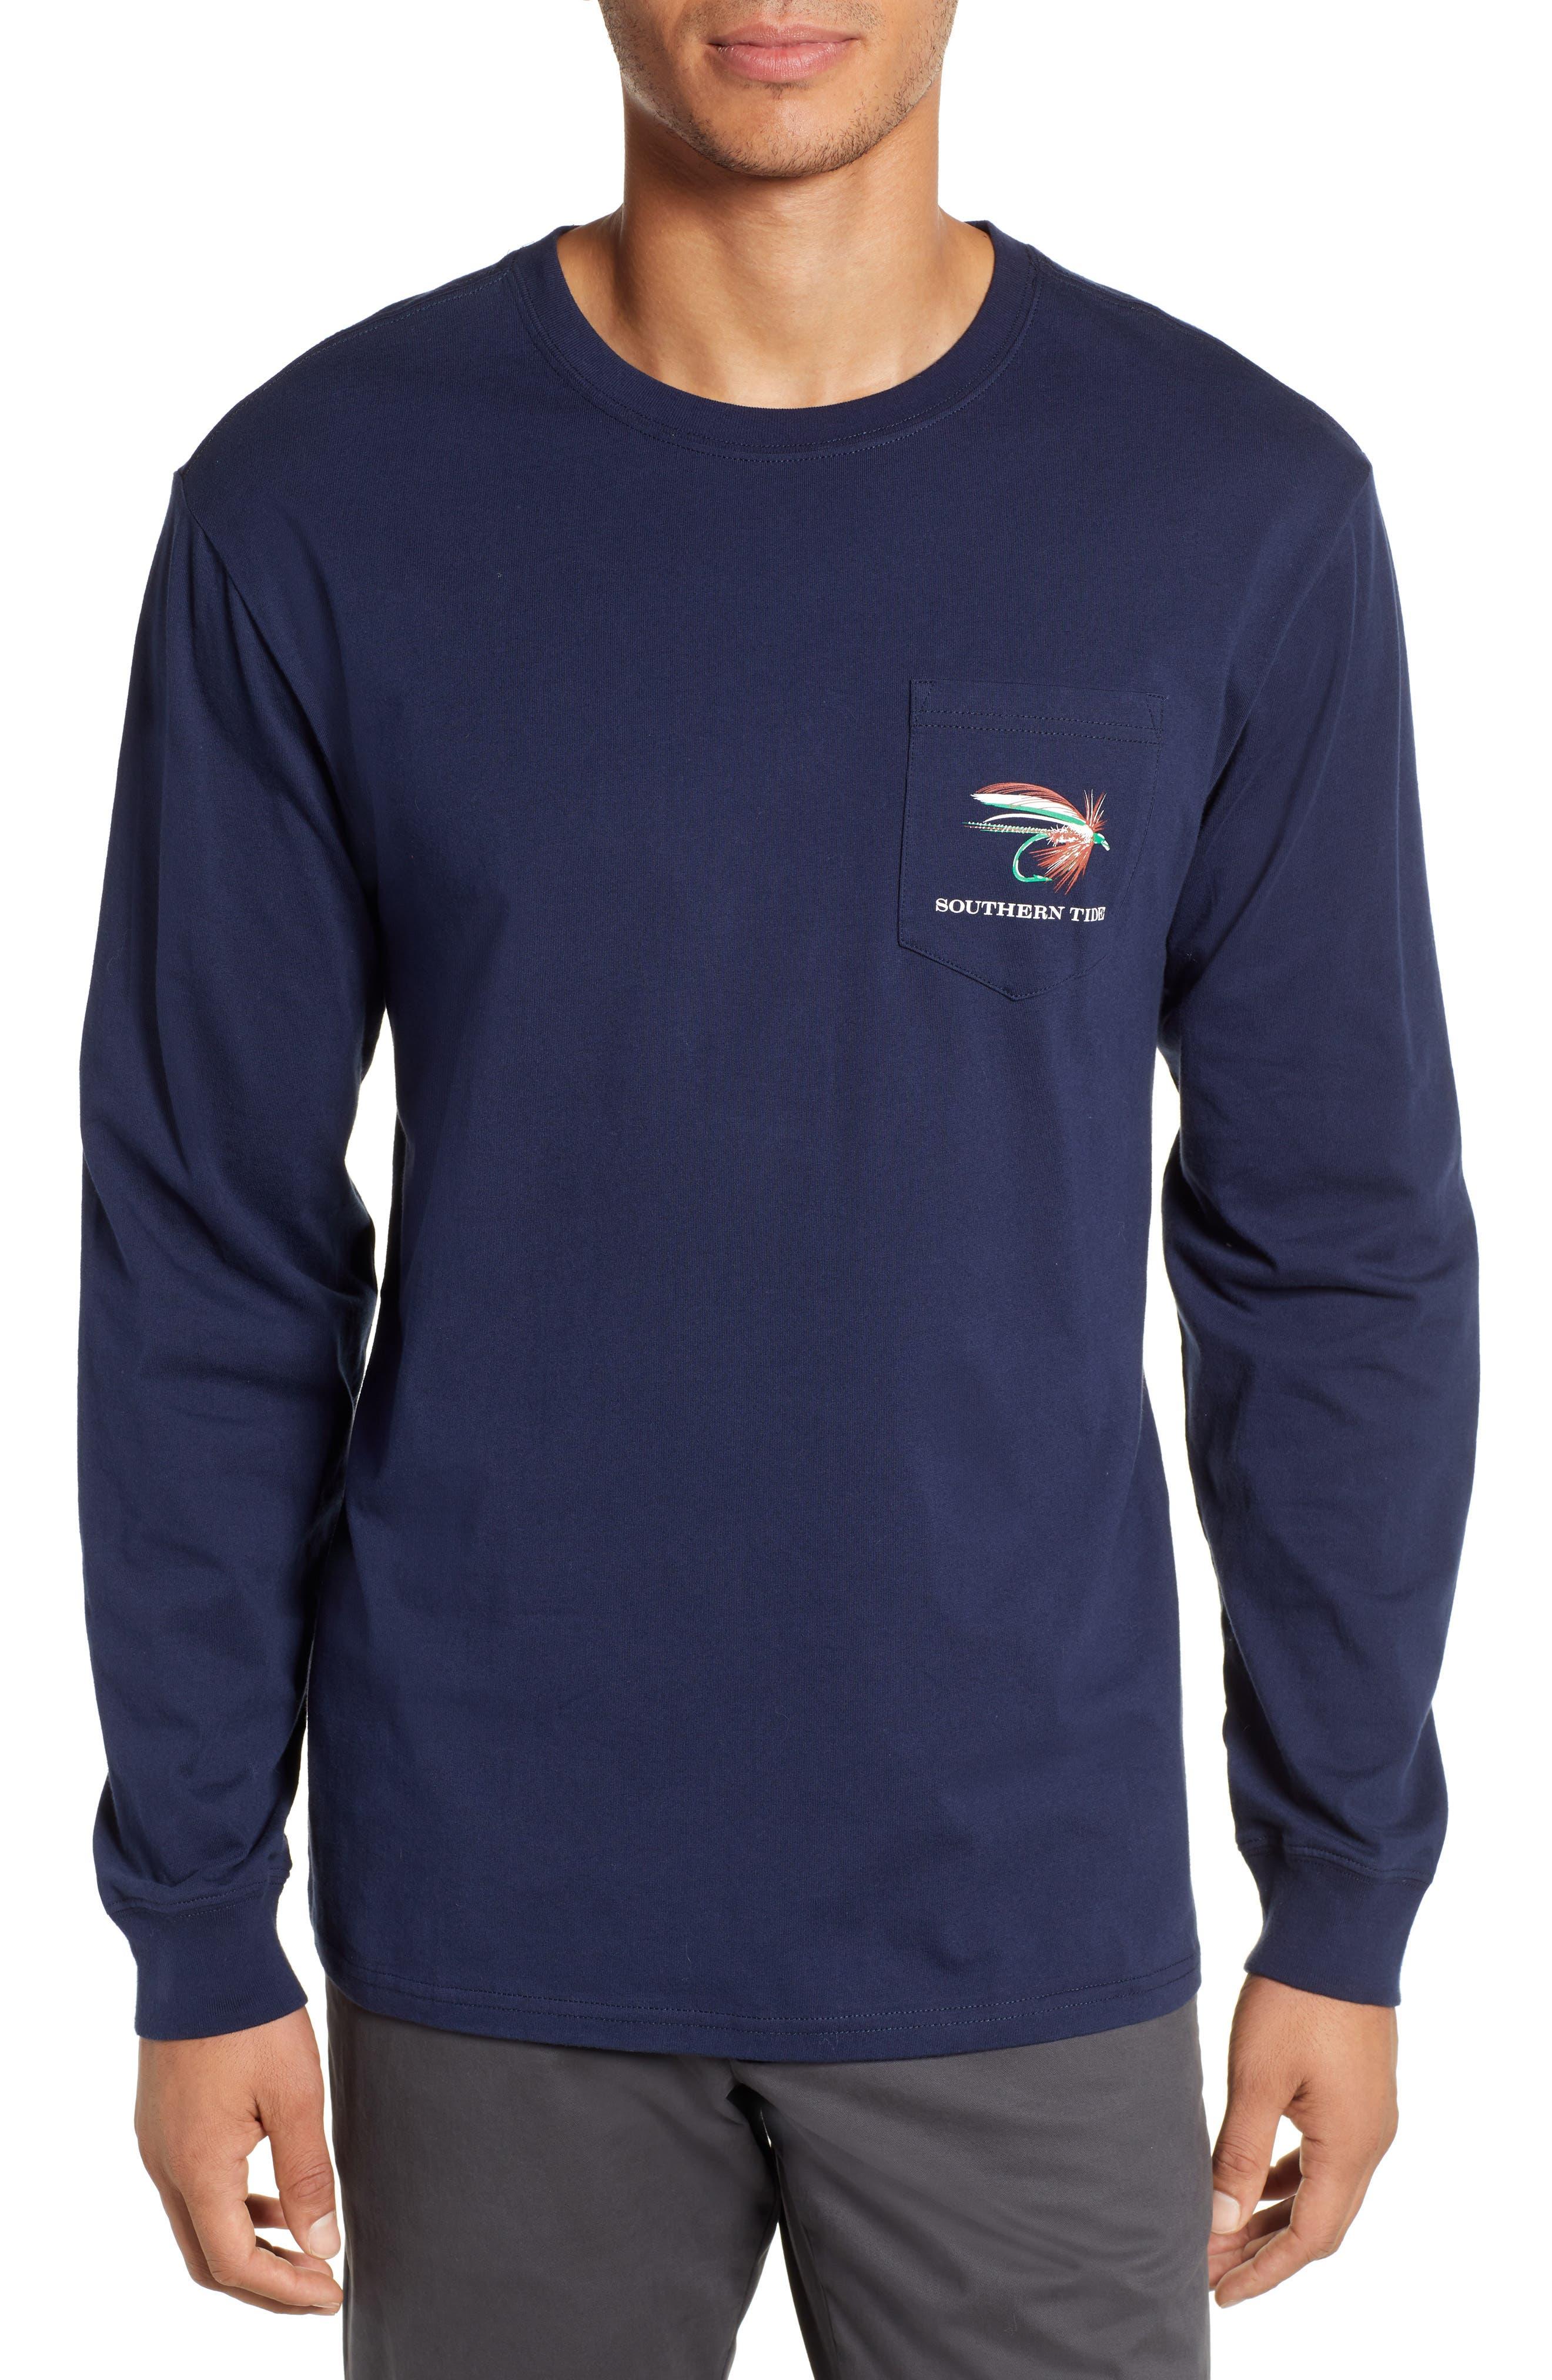 12 Flies of Christmas T-Shirt,                         Main,                         color, TRUE NAVY